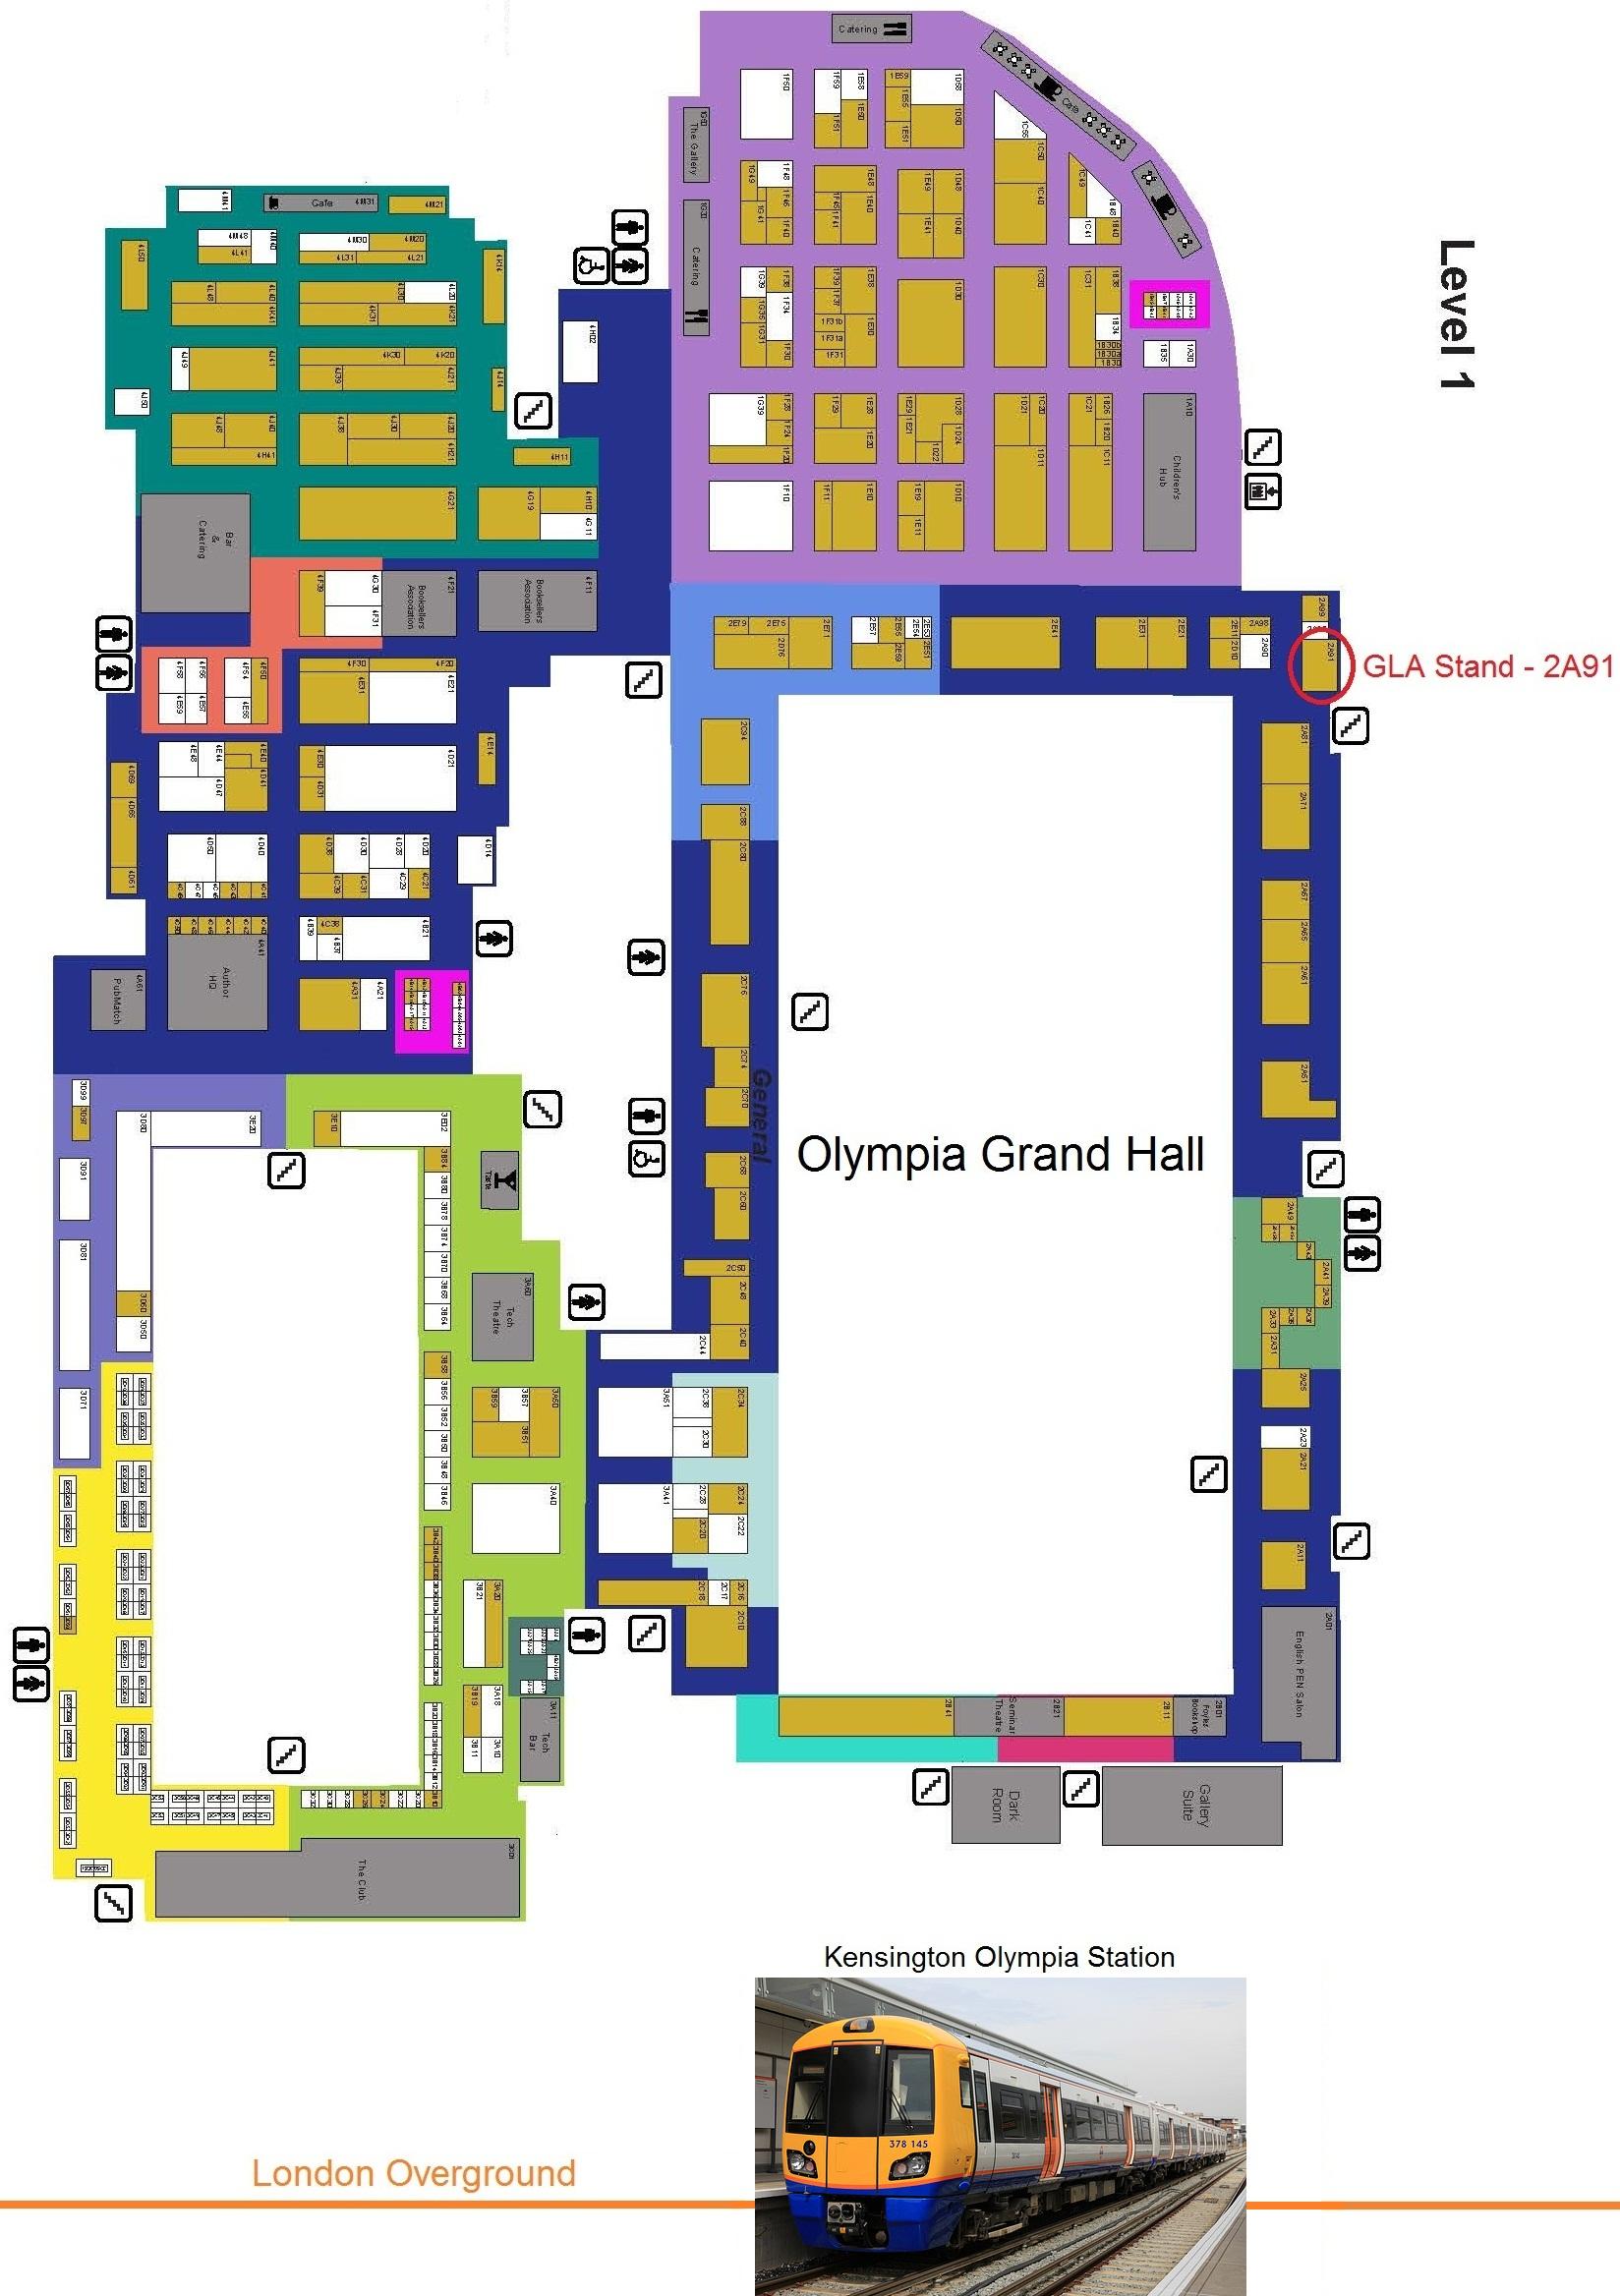 News publishers representation gla world wide representation bookfair 2016 lbf 1st floor map gumiabroncs Choice Image